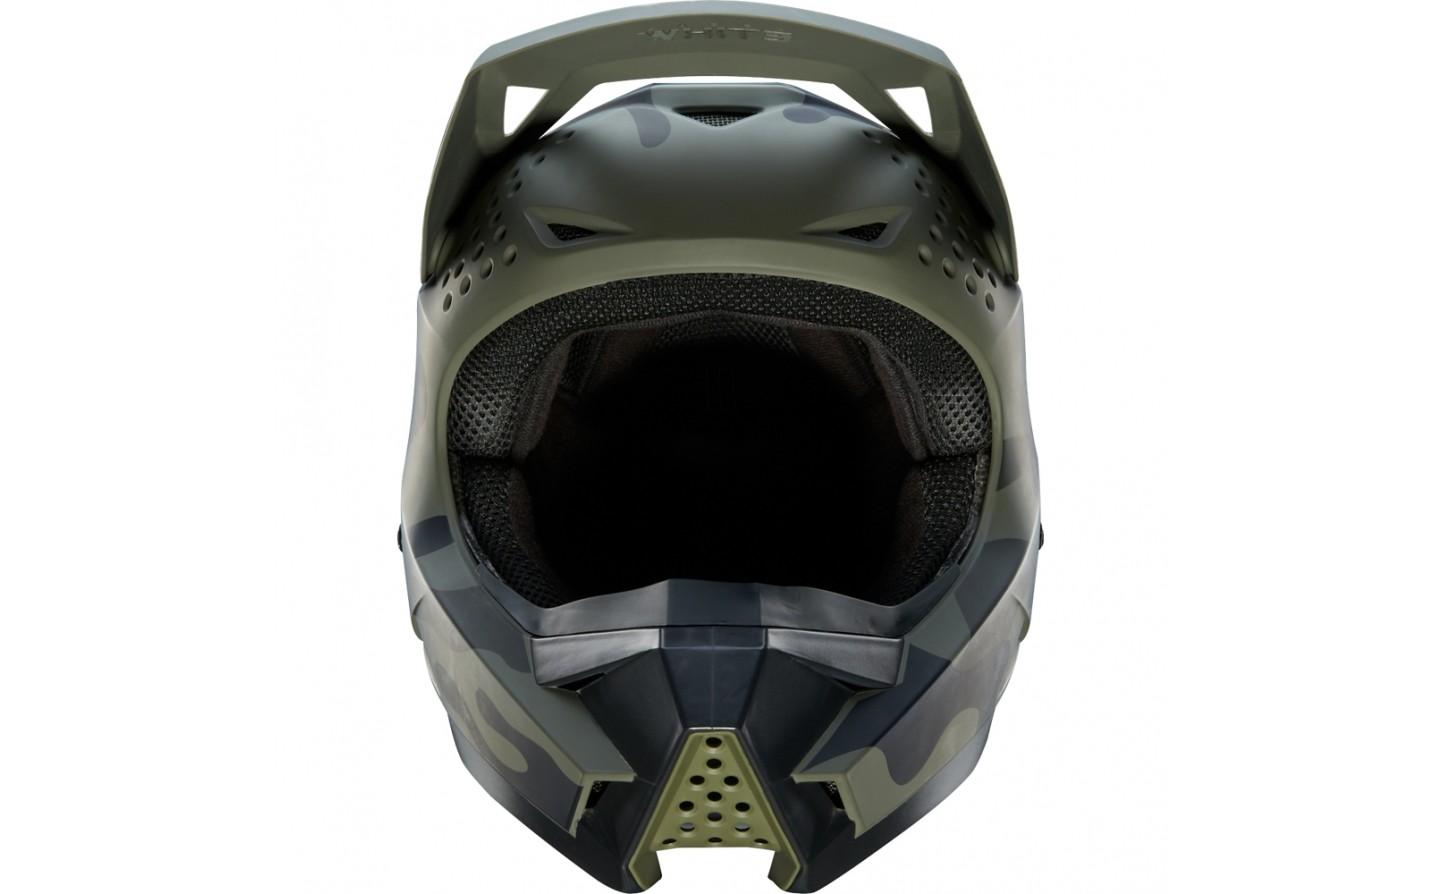 casco shift whit3 camo talle xl (61-62cm)